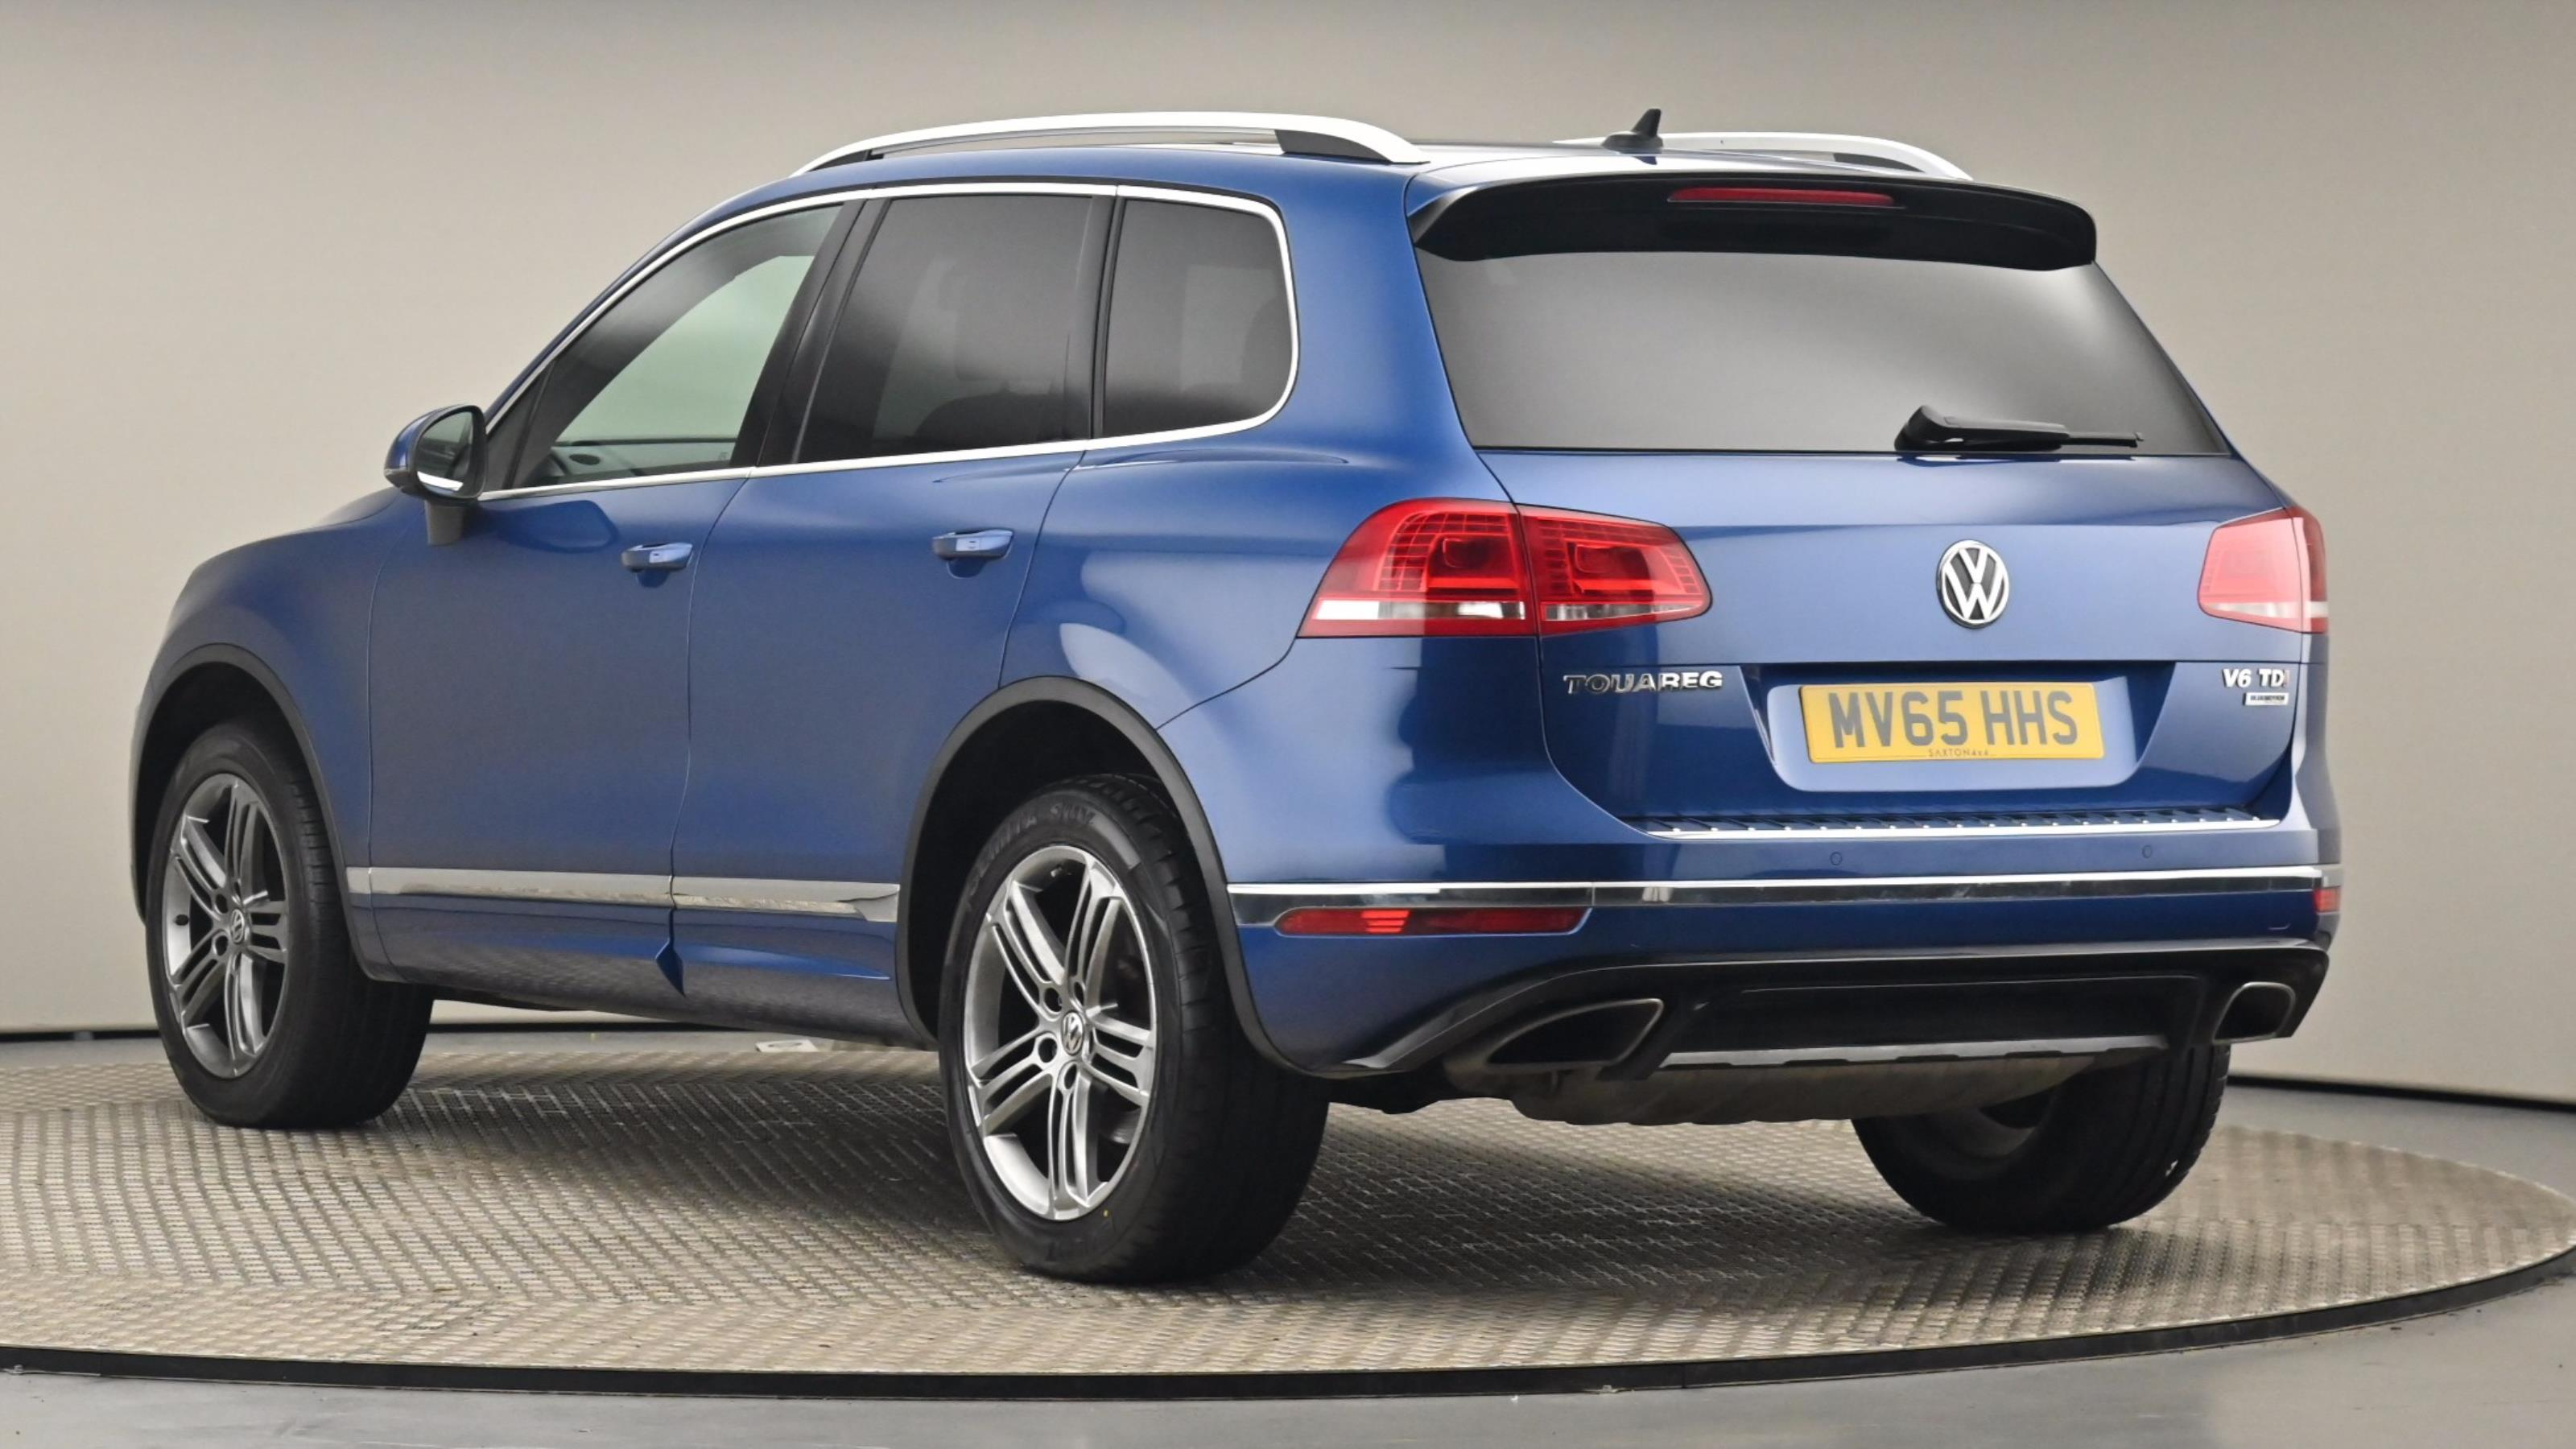 Used 2015 Volkswagen TOUAREG 3.0 V6 TDI BlueMotion Tech 262 R Line 5dr Tip Auto BLUE at Saxton4x4